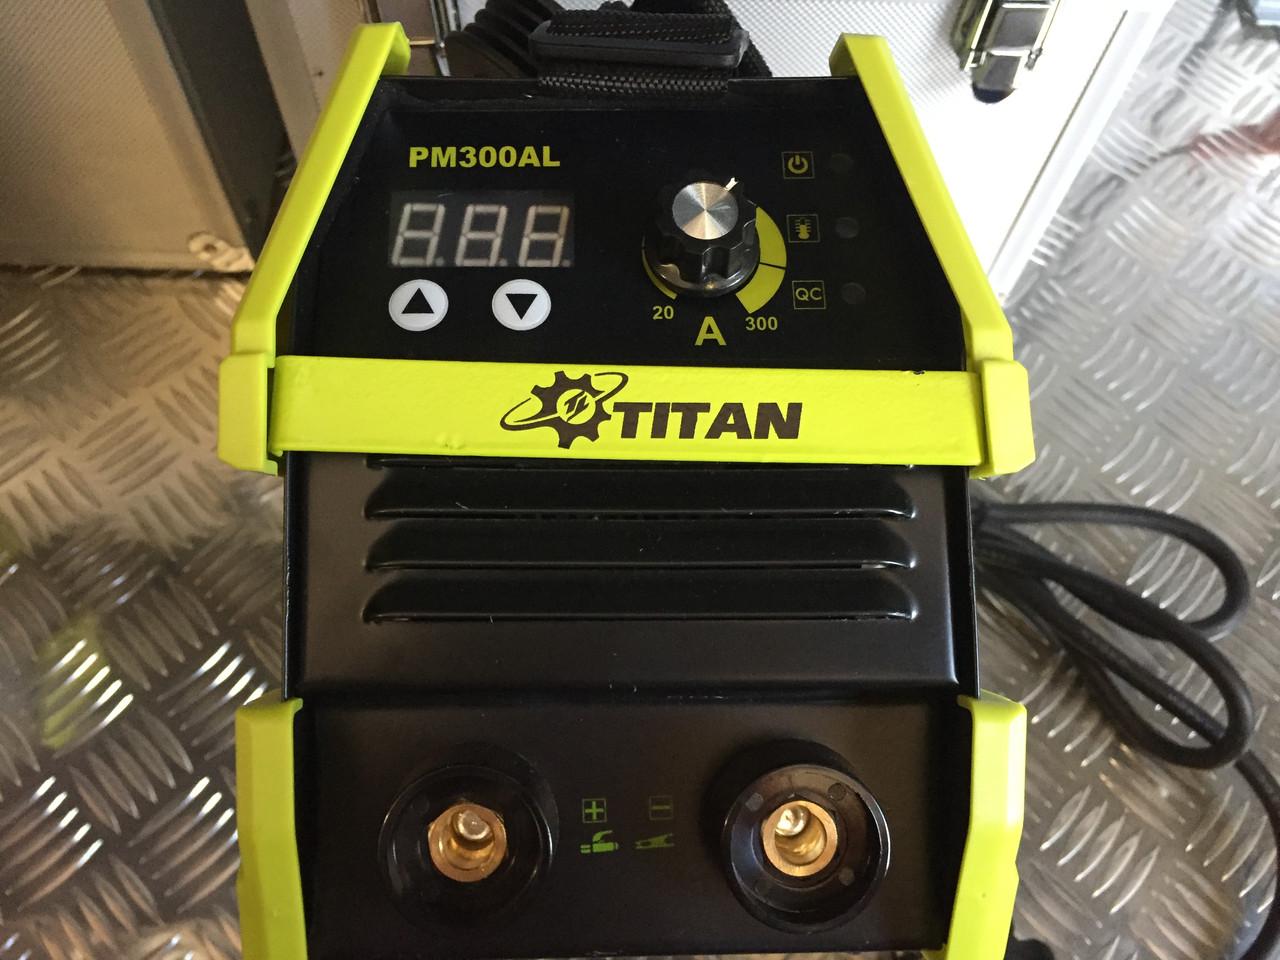 Cварочный инвертор Титан PM300 AL